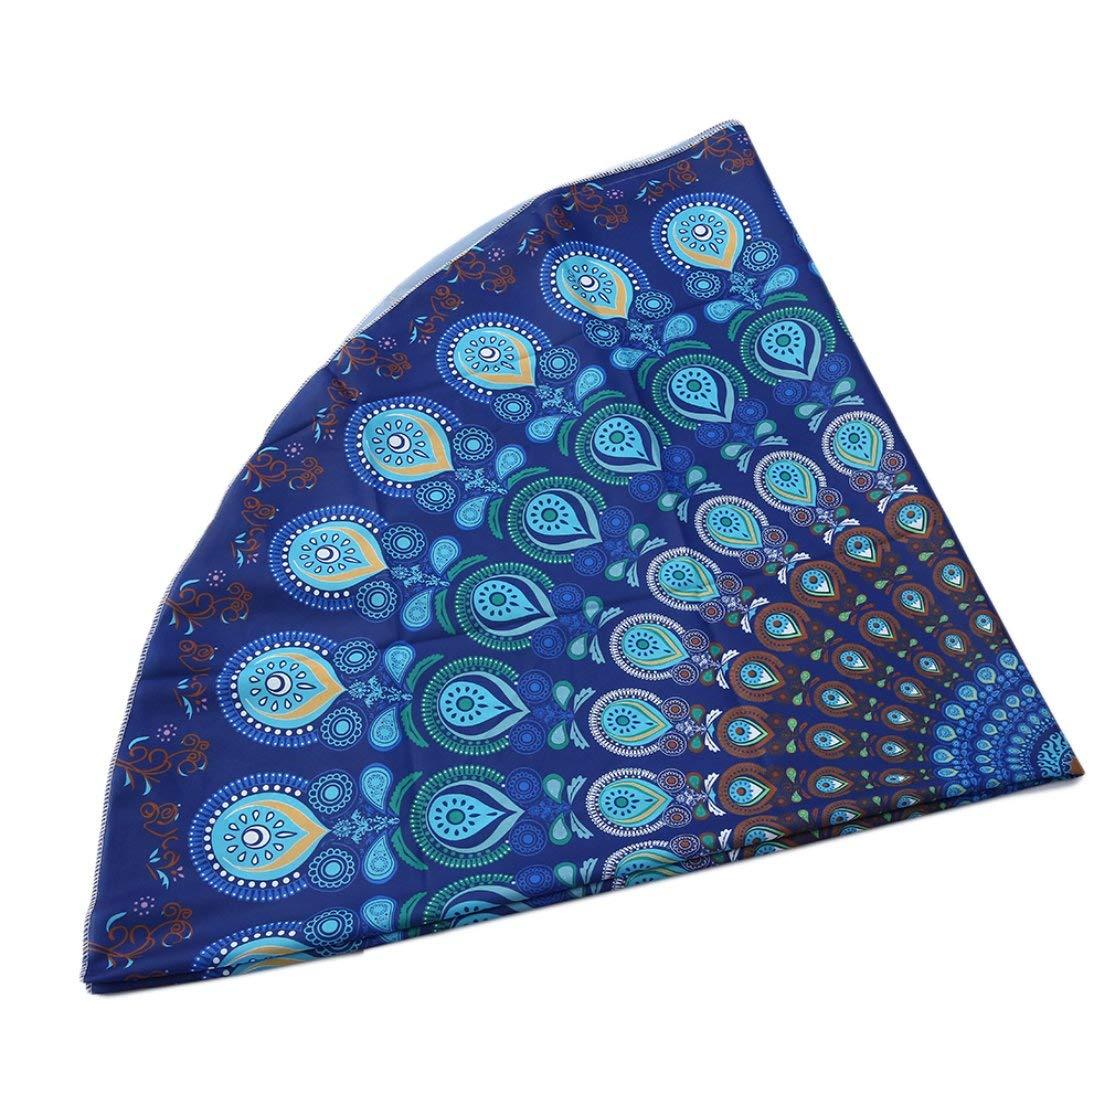 Candyboom /Único Ronda India Toalla Scarve Moda Mandala Playa Picnic Throw Alfombra Manta C/ómoda Algod/ón Toalla de Playa Estera de Yoga